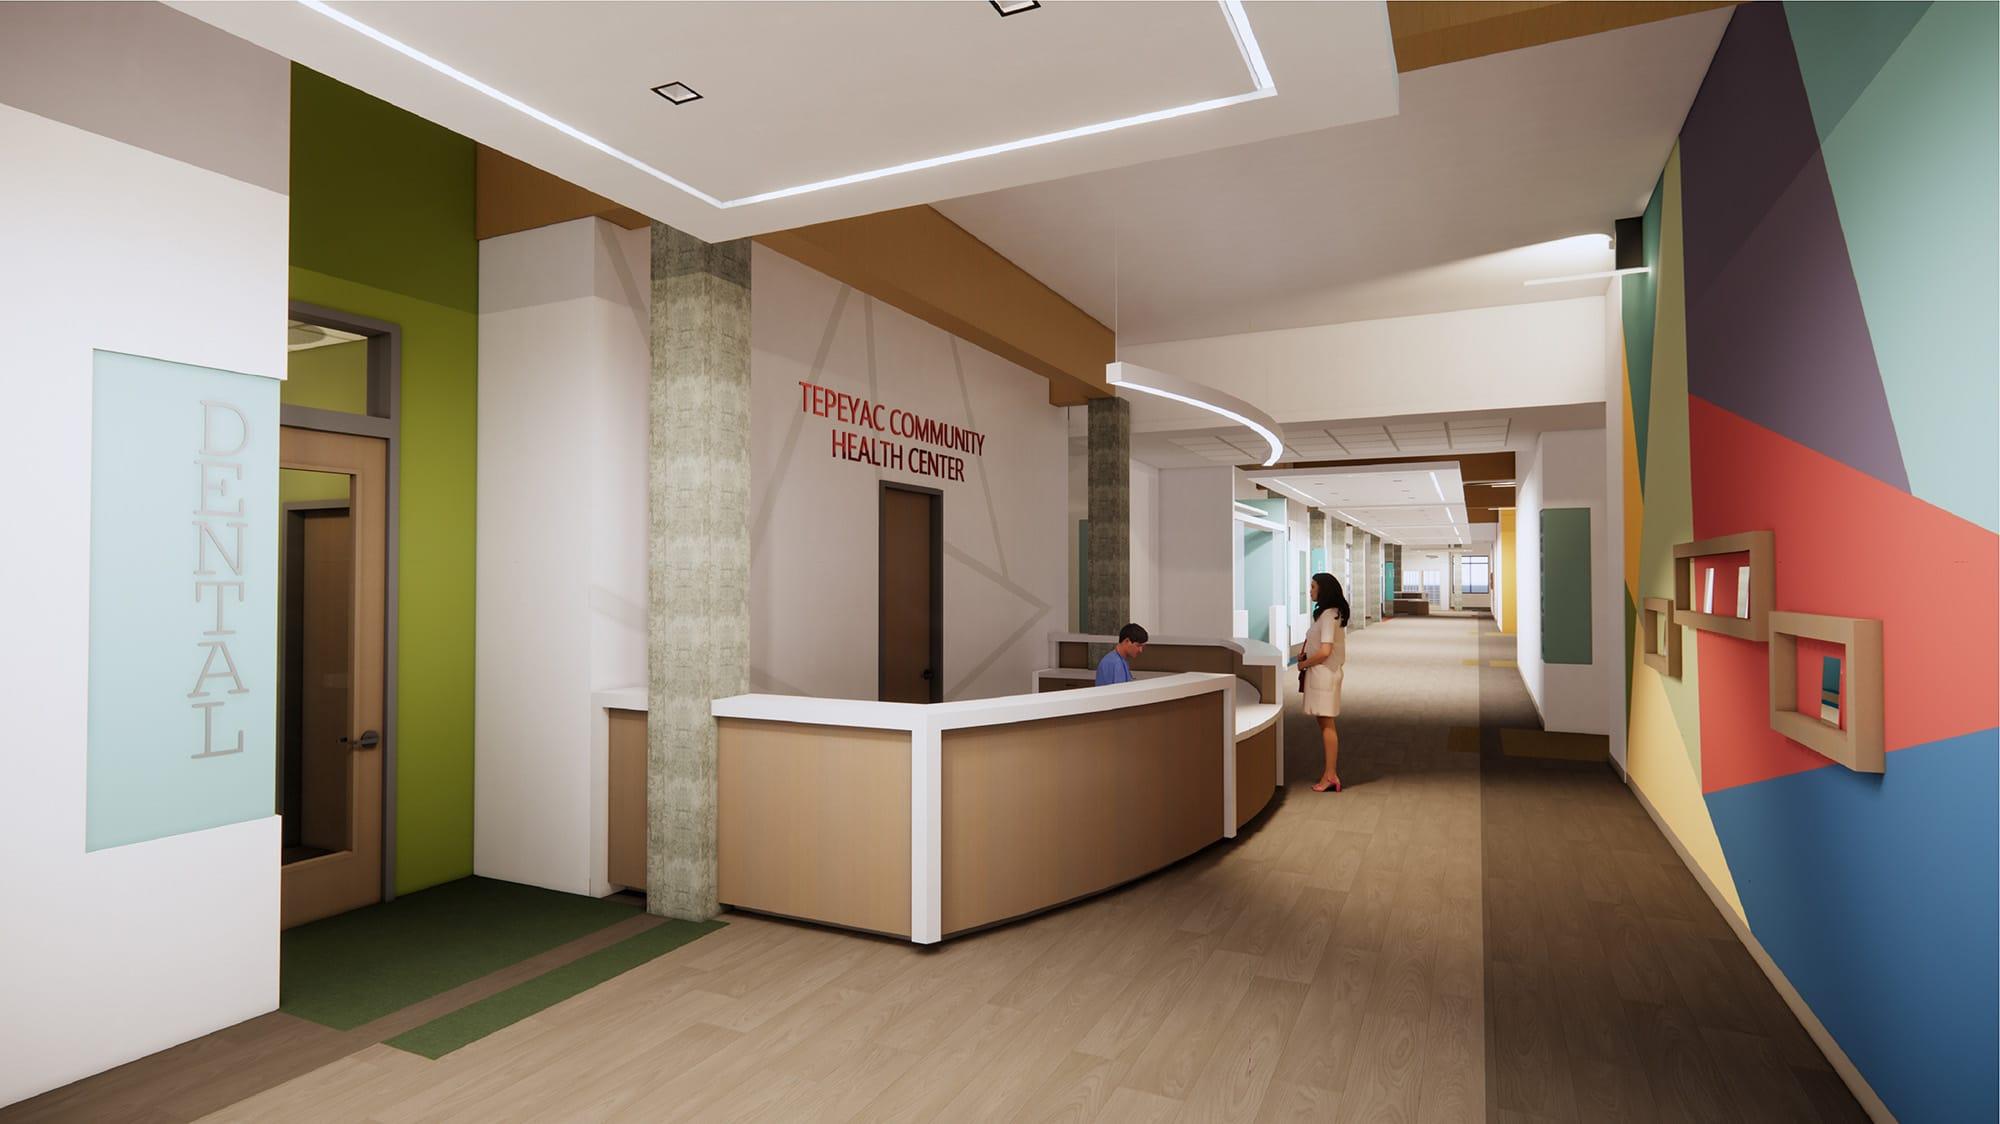 Clinica Tepeyac Reception Desk